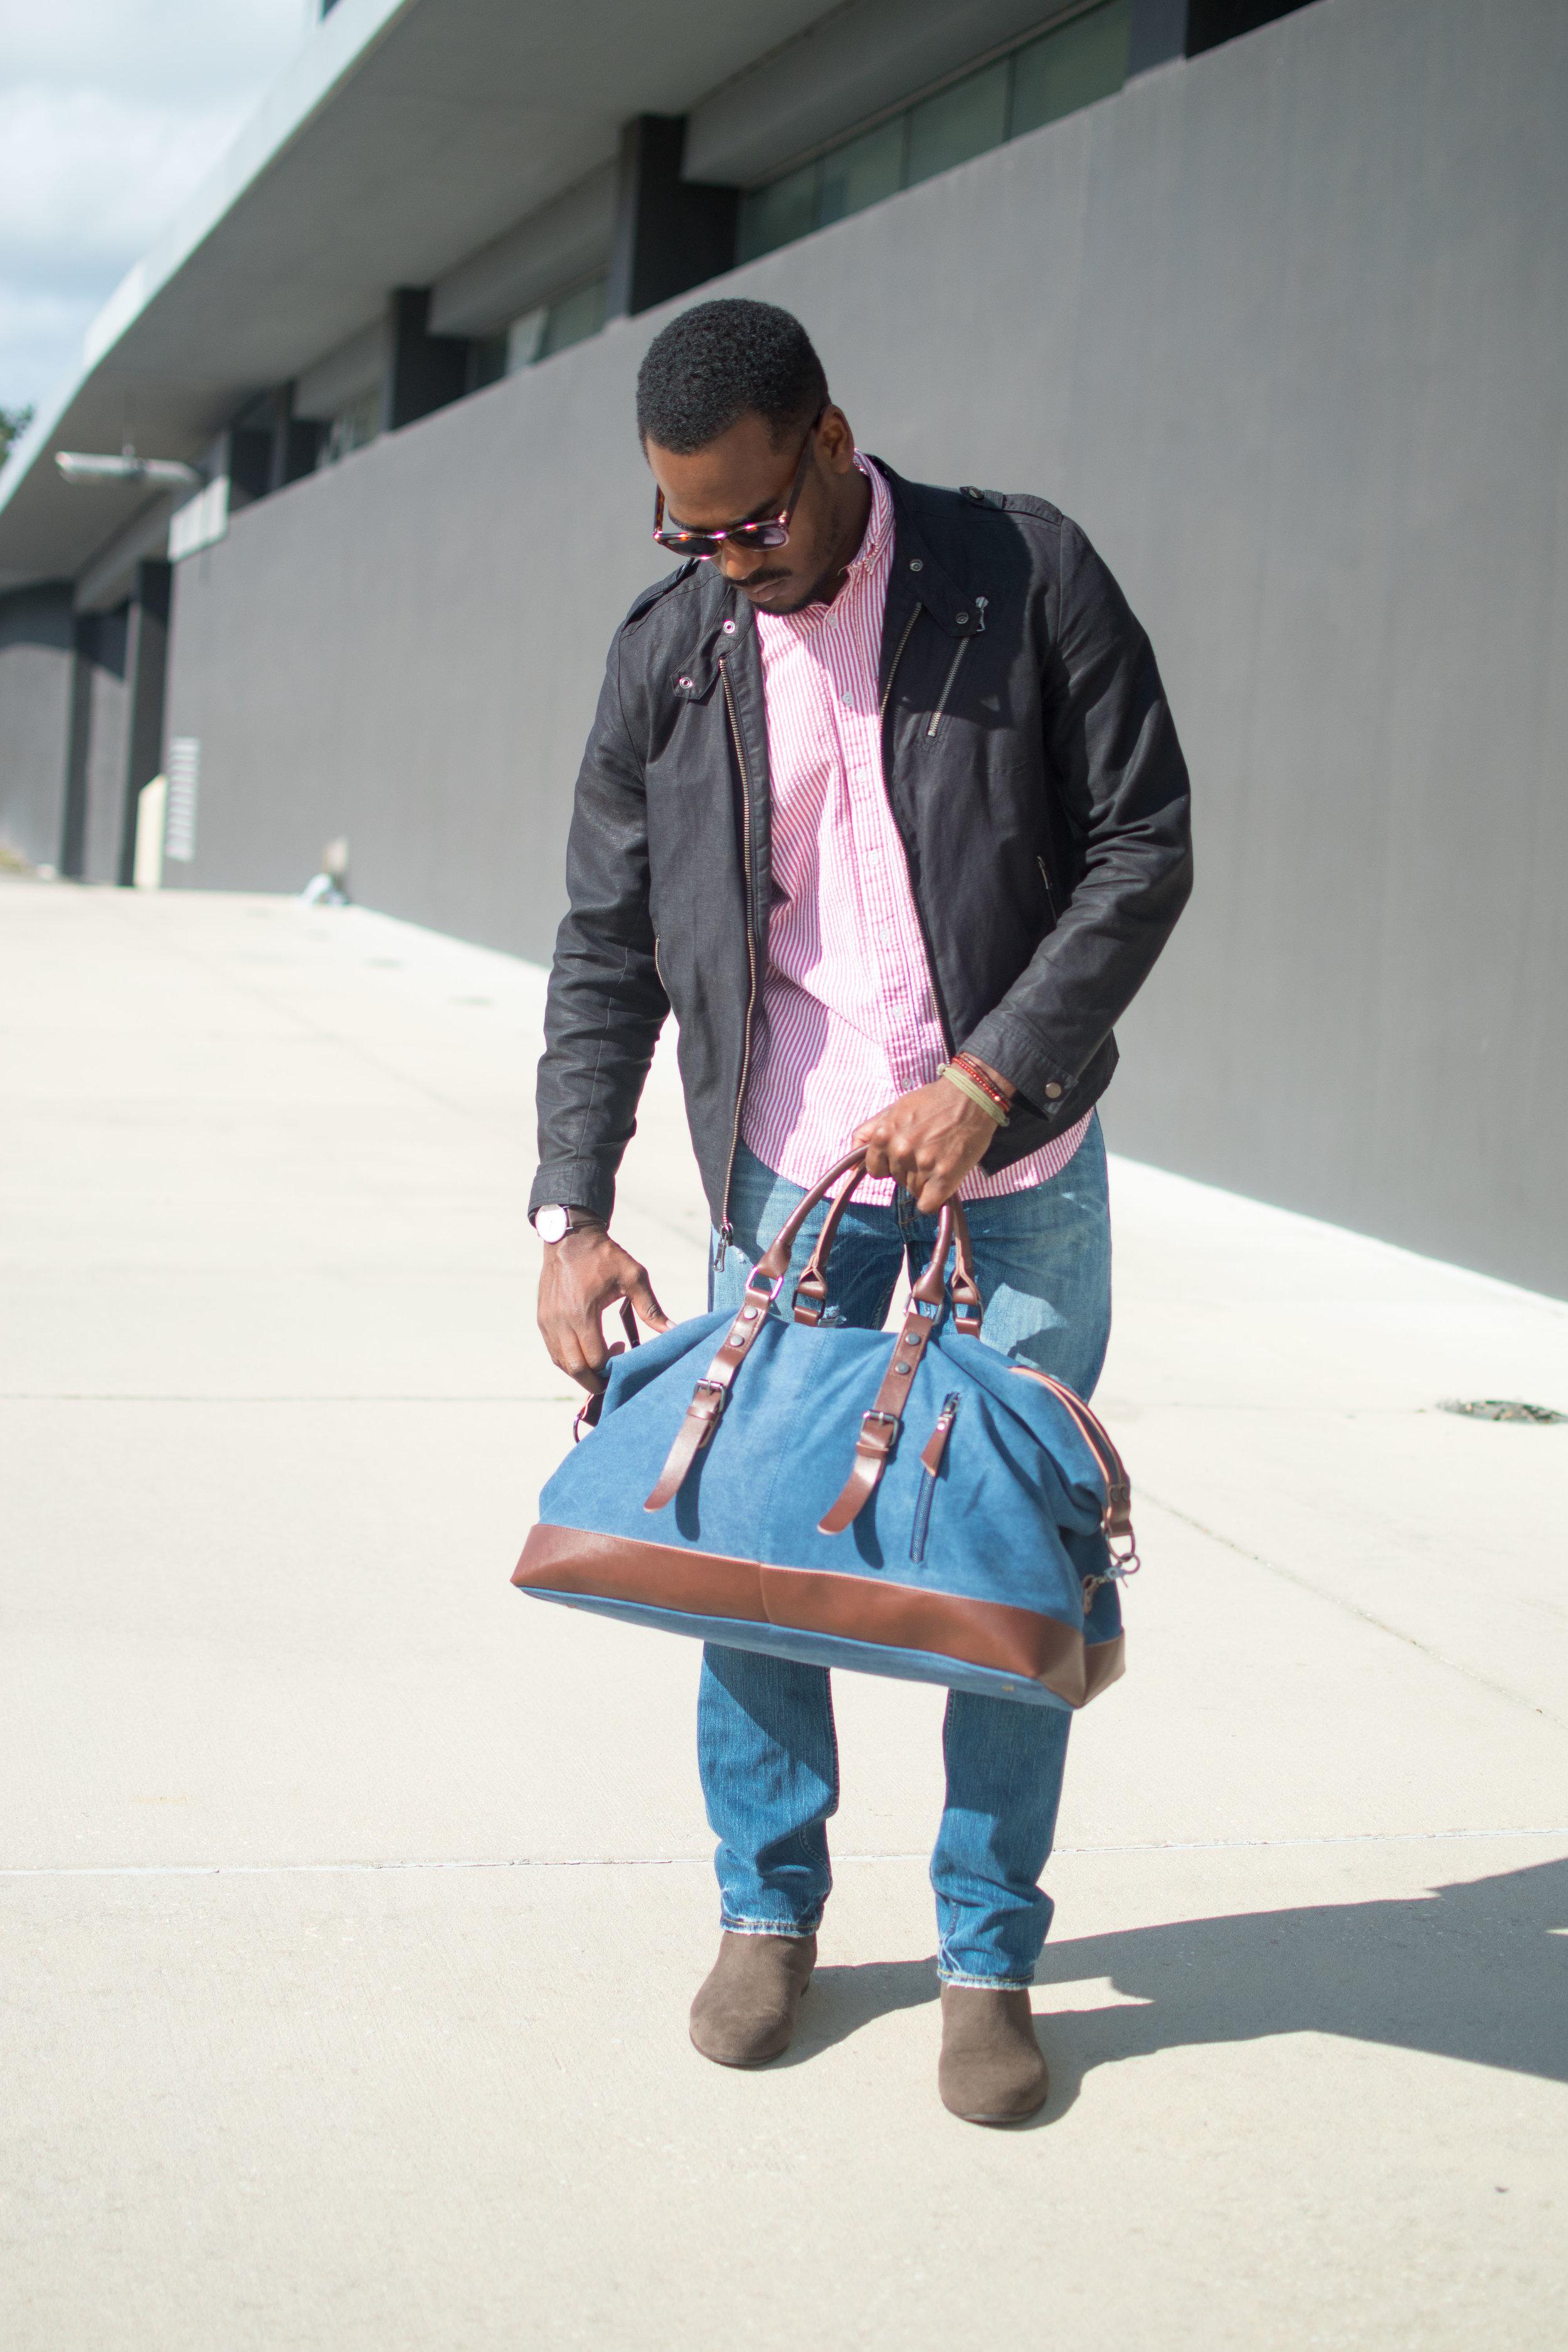 Duffel Bag Travel Wear.jpg